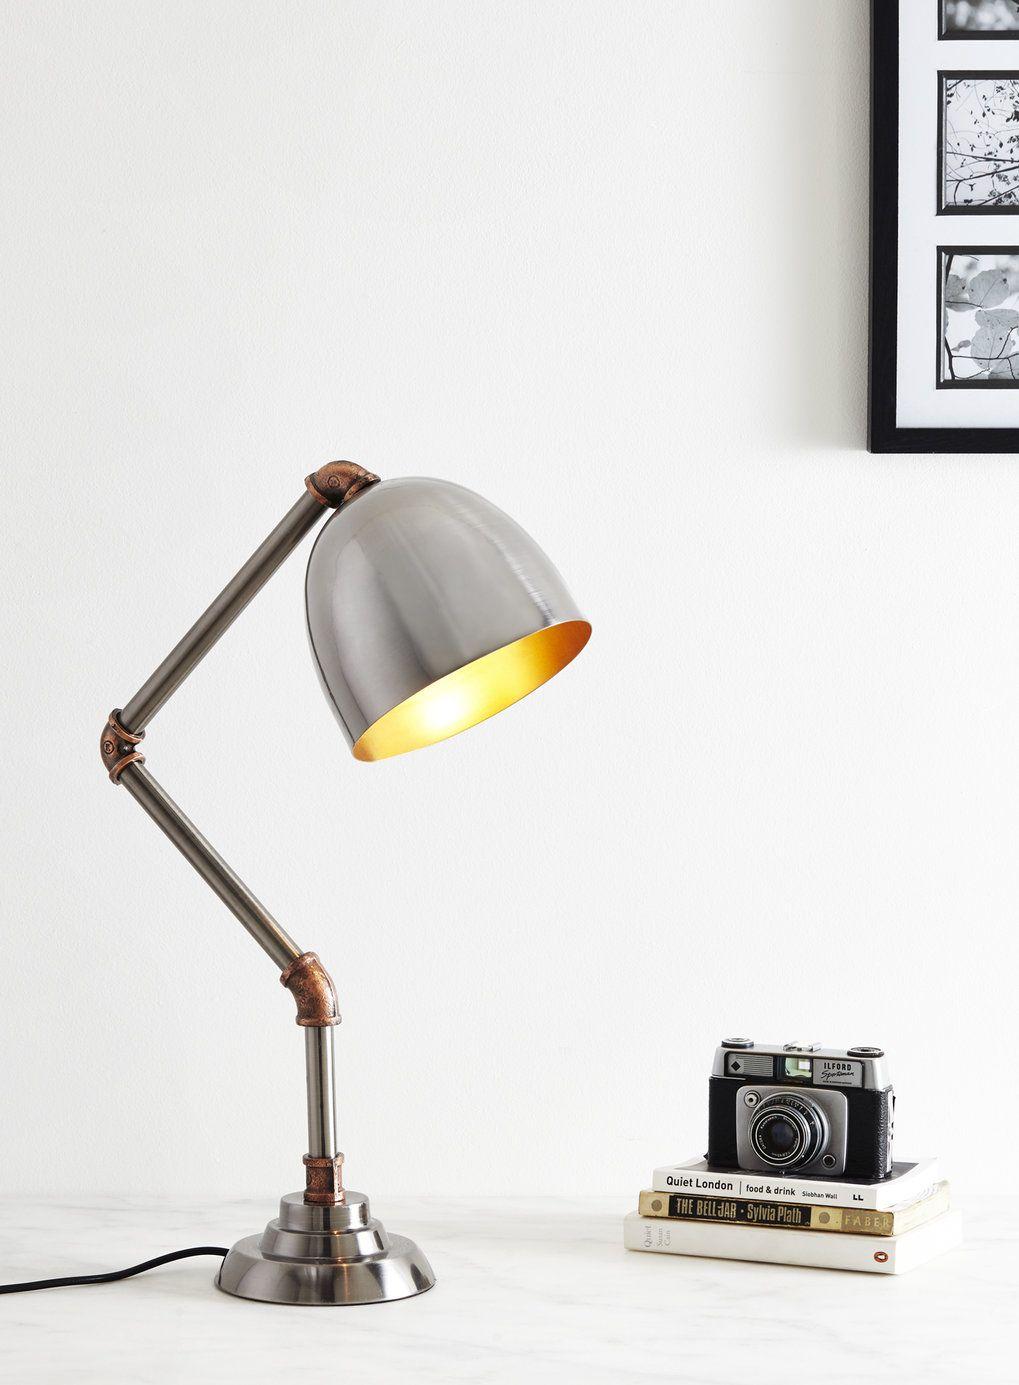 Hugo Piped Task Lamp - Vintage Curiosity - Home, Lighting ...